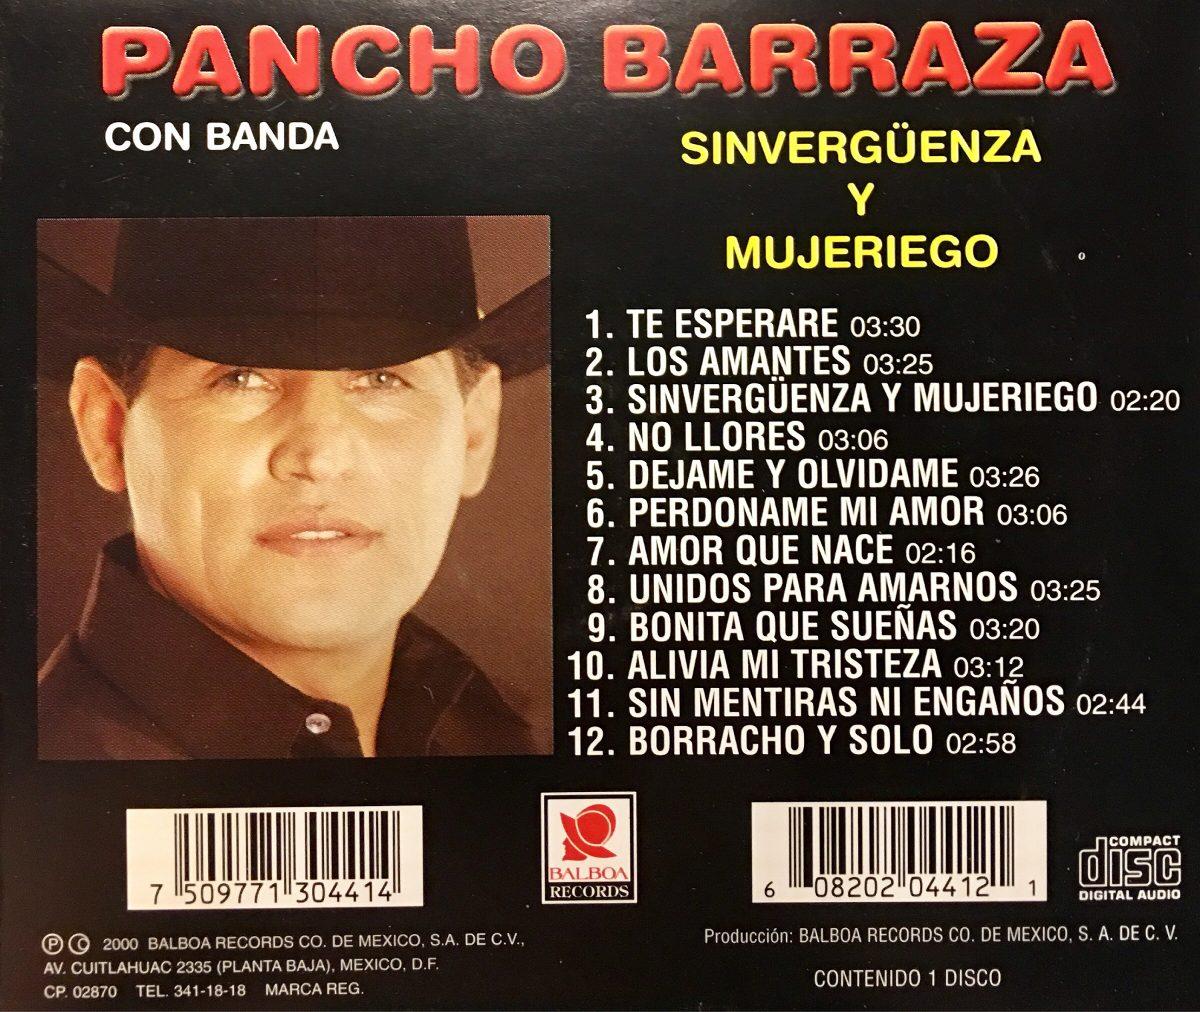 PANCHO BARRAZA (Sinverguenza Y Mujeriego)